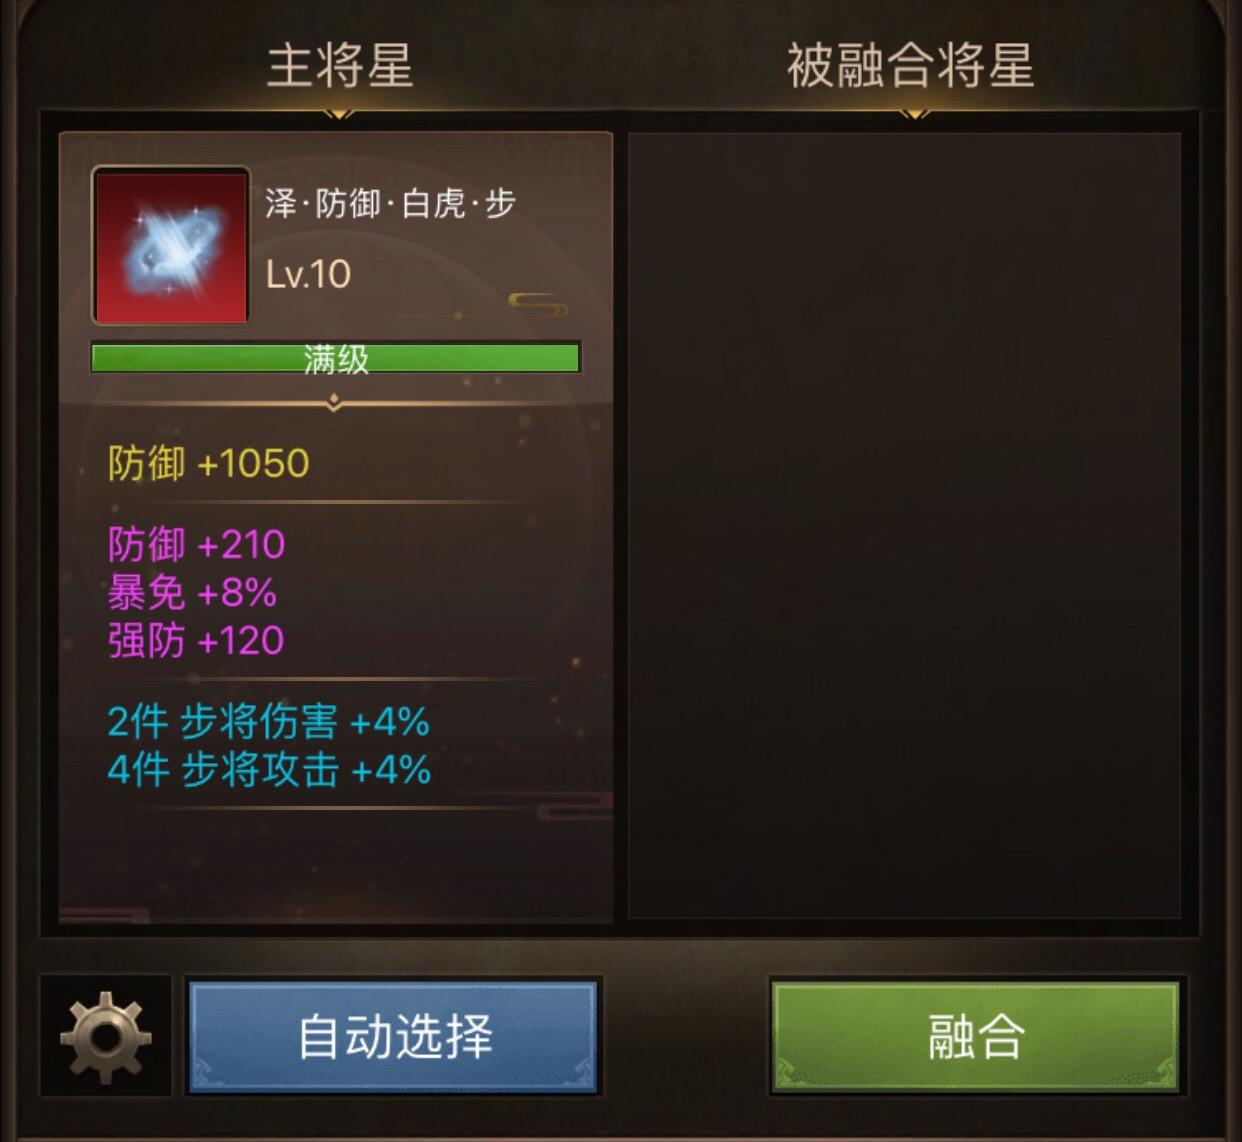 C8F63AB4-24E6-40BF-950C-15729A9586B4.jpeg